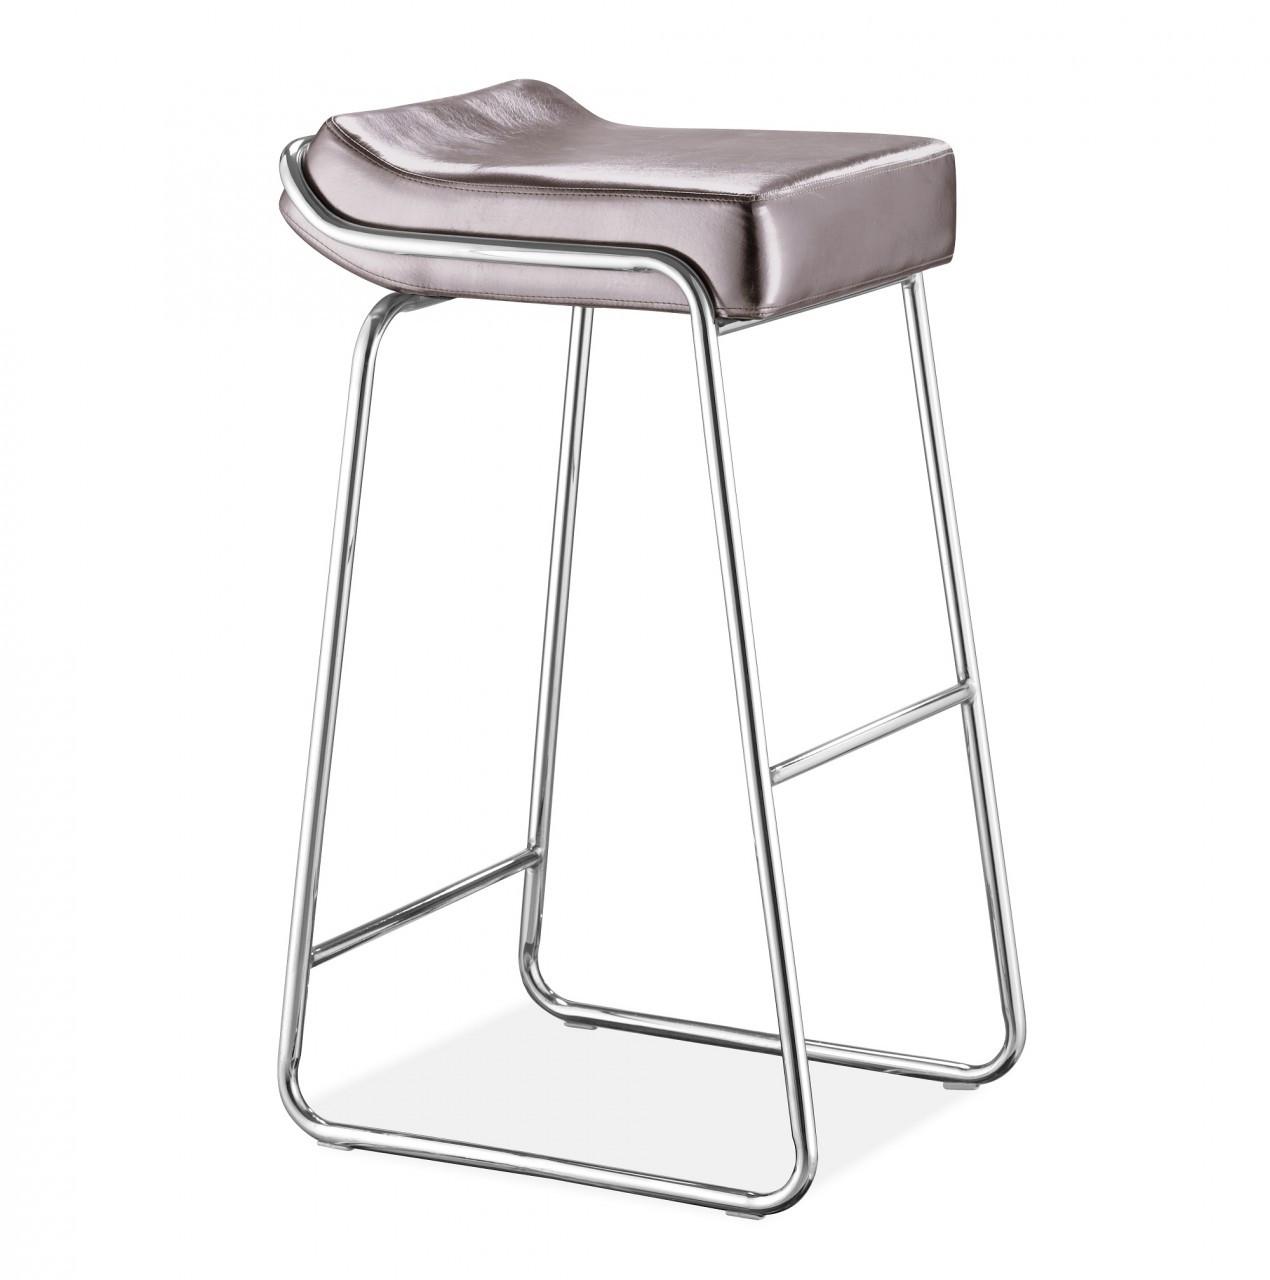 Pleasing Wedge Bar Stool Unemploymentrelief Wooden Chair Designs For Living Room Unemploymentrelieforg